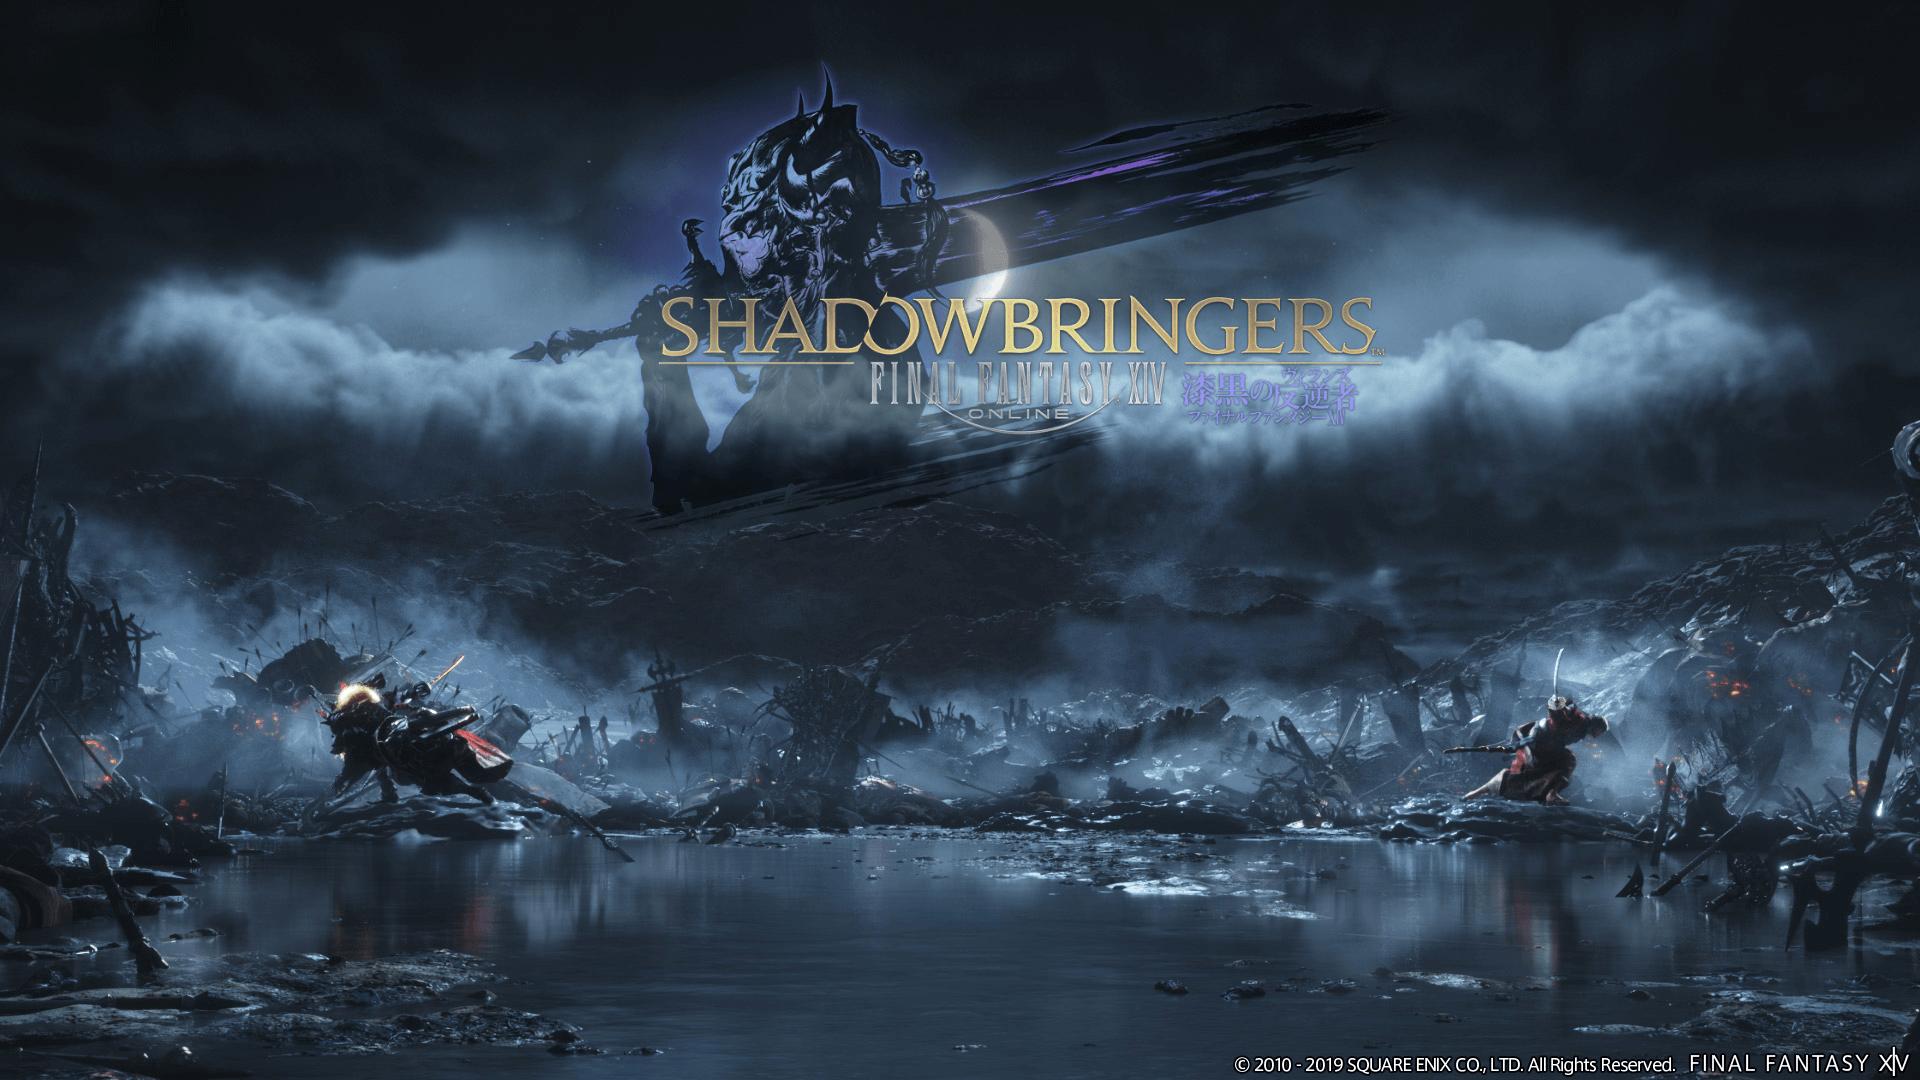 Final Fantasy Xiv Shadow Bringers Wallpapers Wallpaper Cave